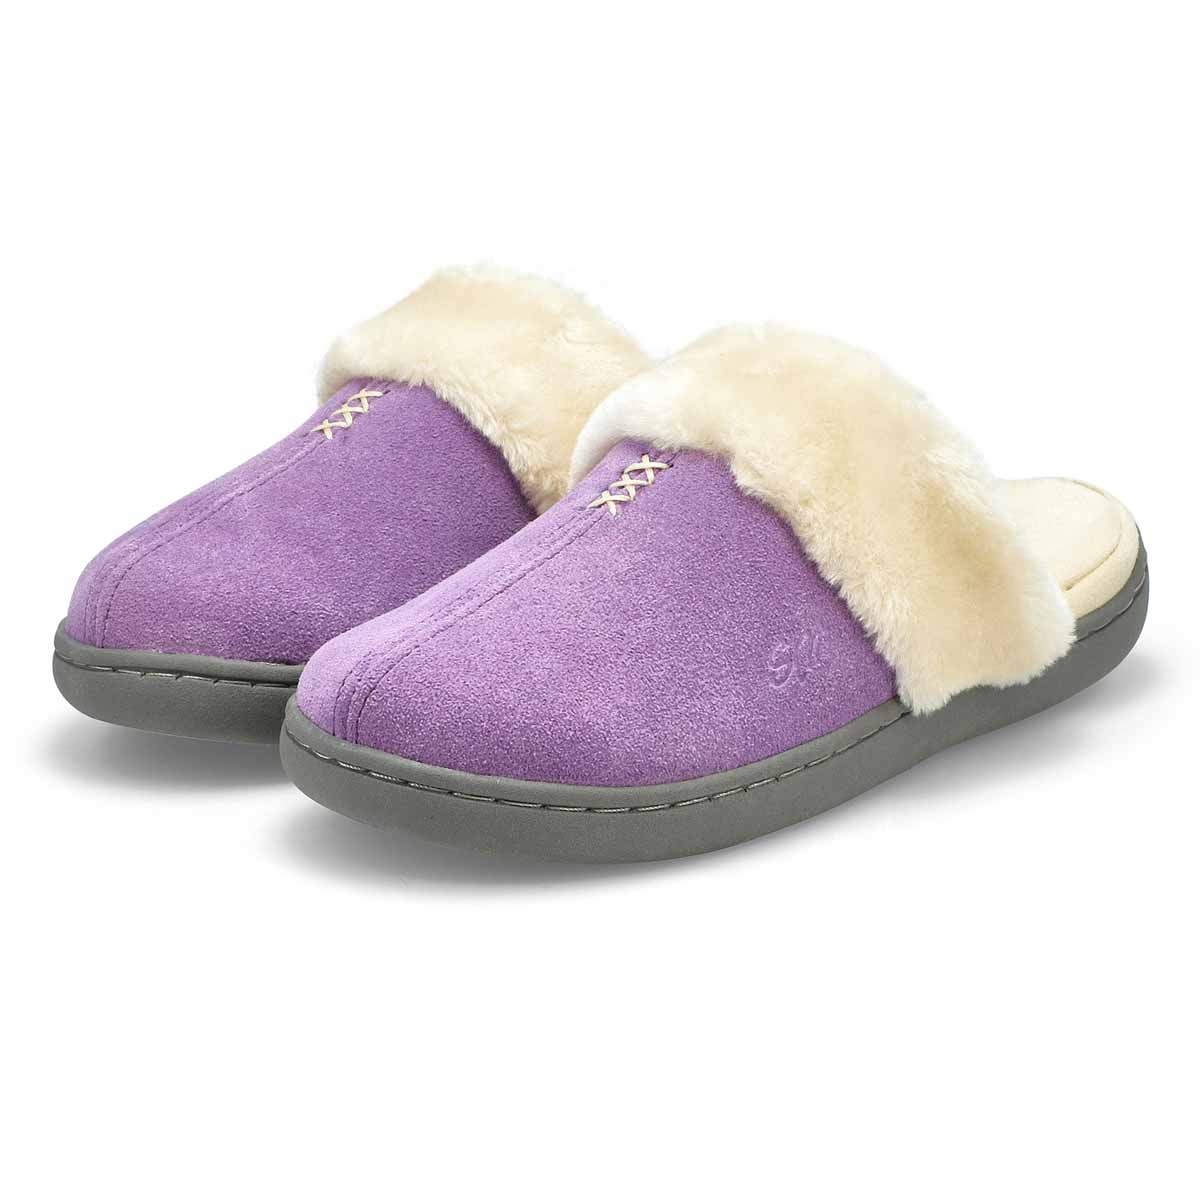 Women's Pauline Open Back Slipper - Lavender